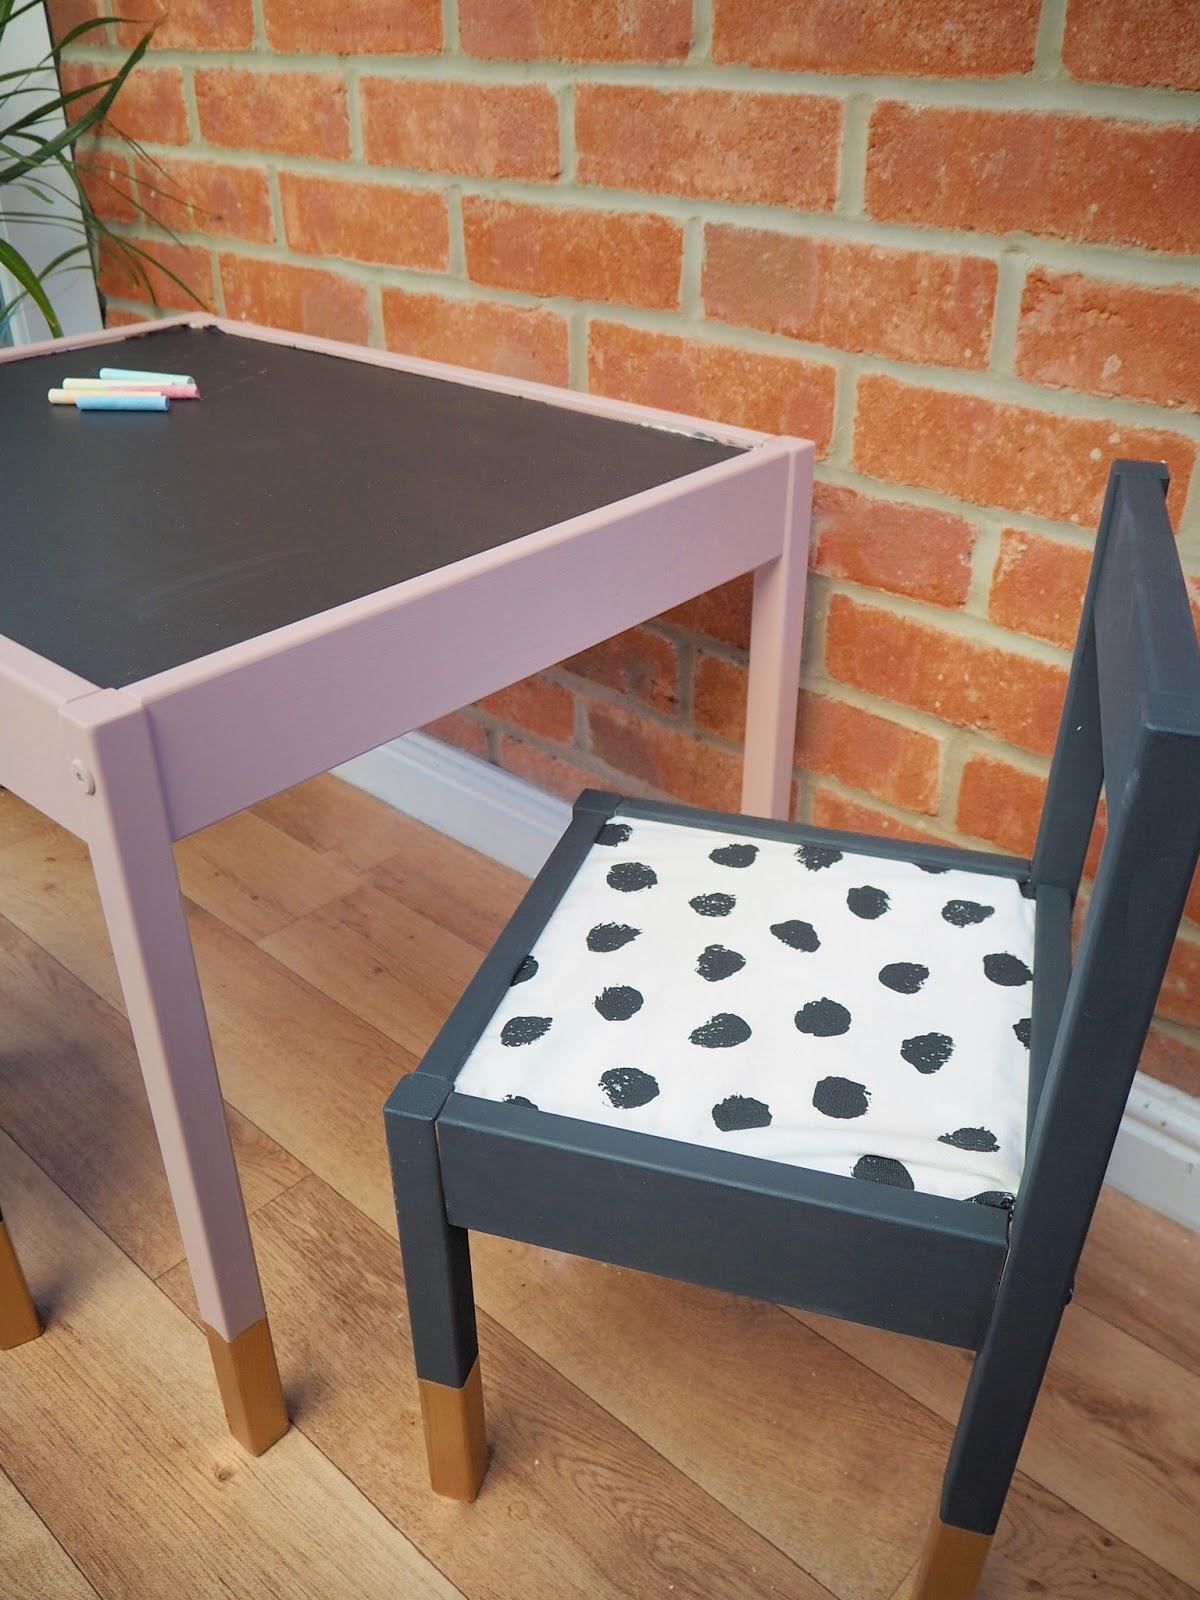 Swell Diy Ikea Hack Latt Childrens Table Chairs Dove Cottage Beutiful Home Inspiration Truamahrainfo